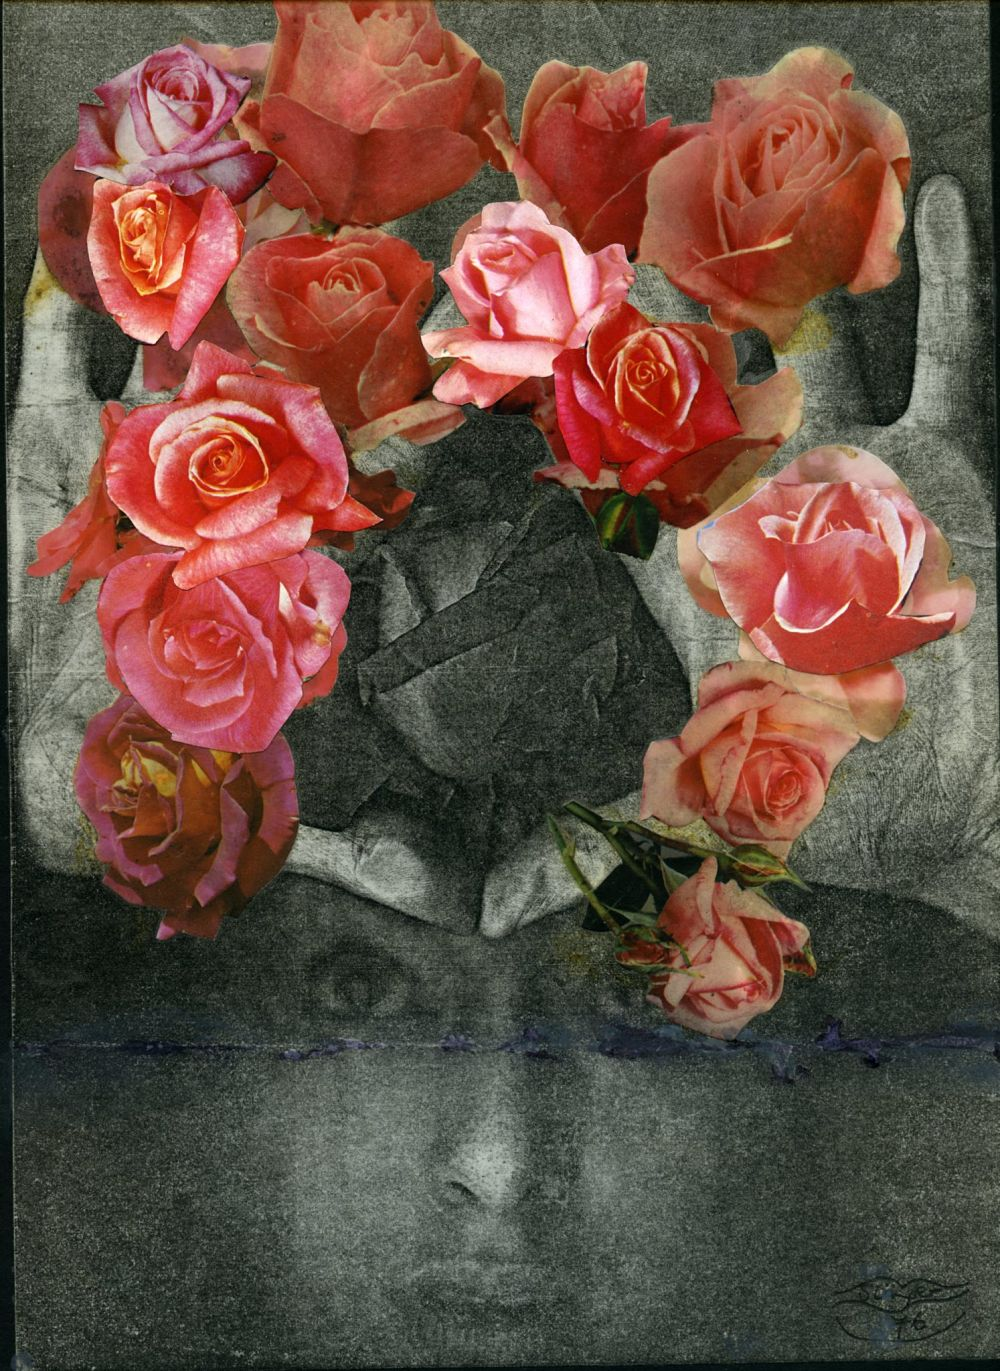 Penny SLINGER, Bouquet, 1976. Xerox self body print with collage 30.5 x 20.3 cm. Copyright the Artist; Courtesy Richard Saltoun Gallery